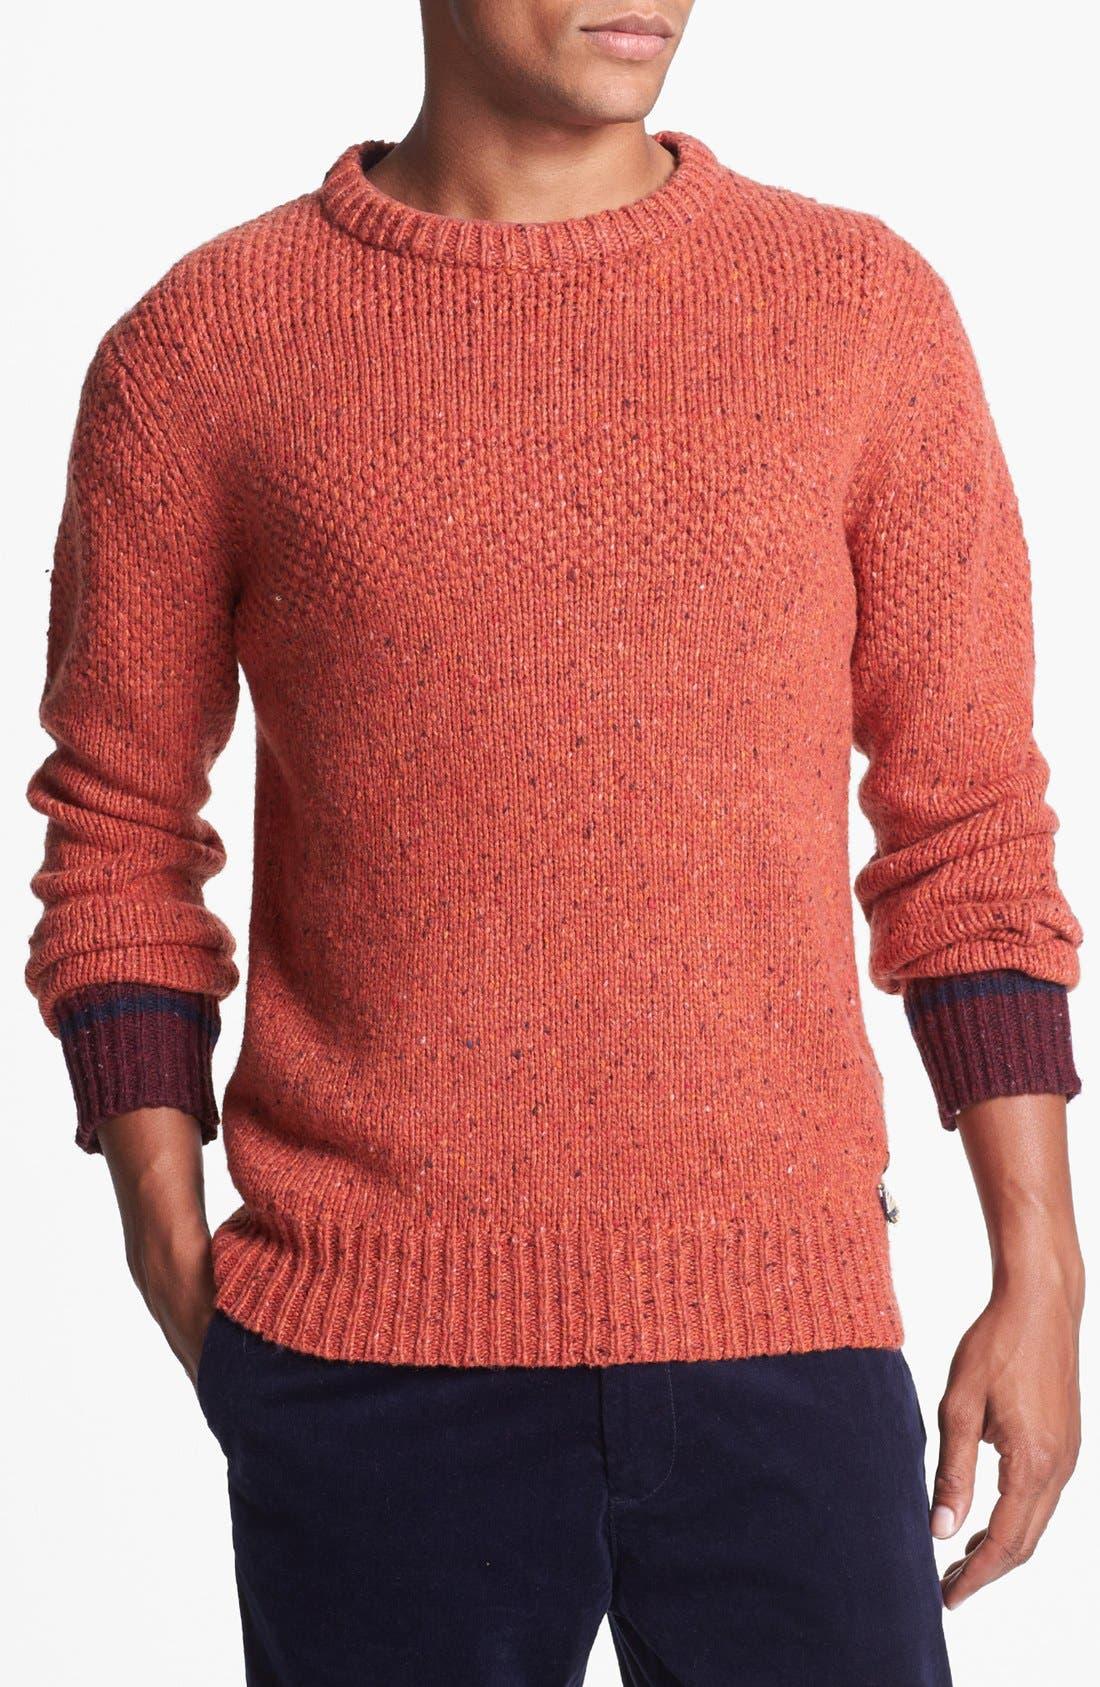 Alternate Image 1 Selected - Scotch & Soda Crewneck Sweater